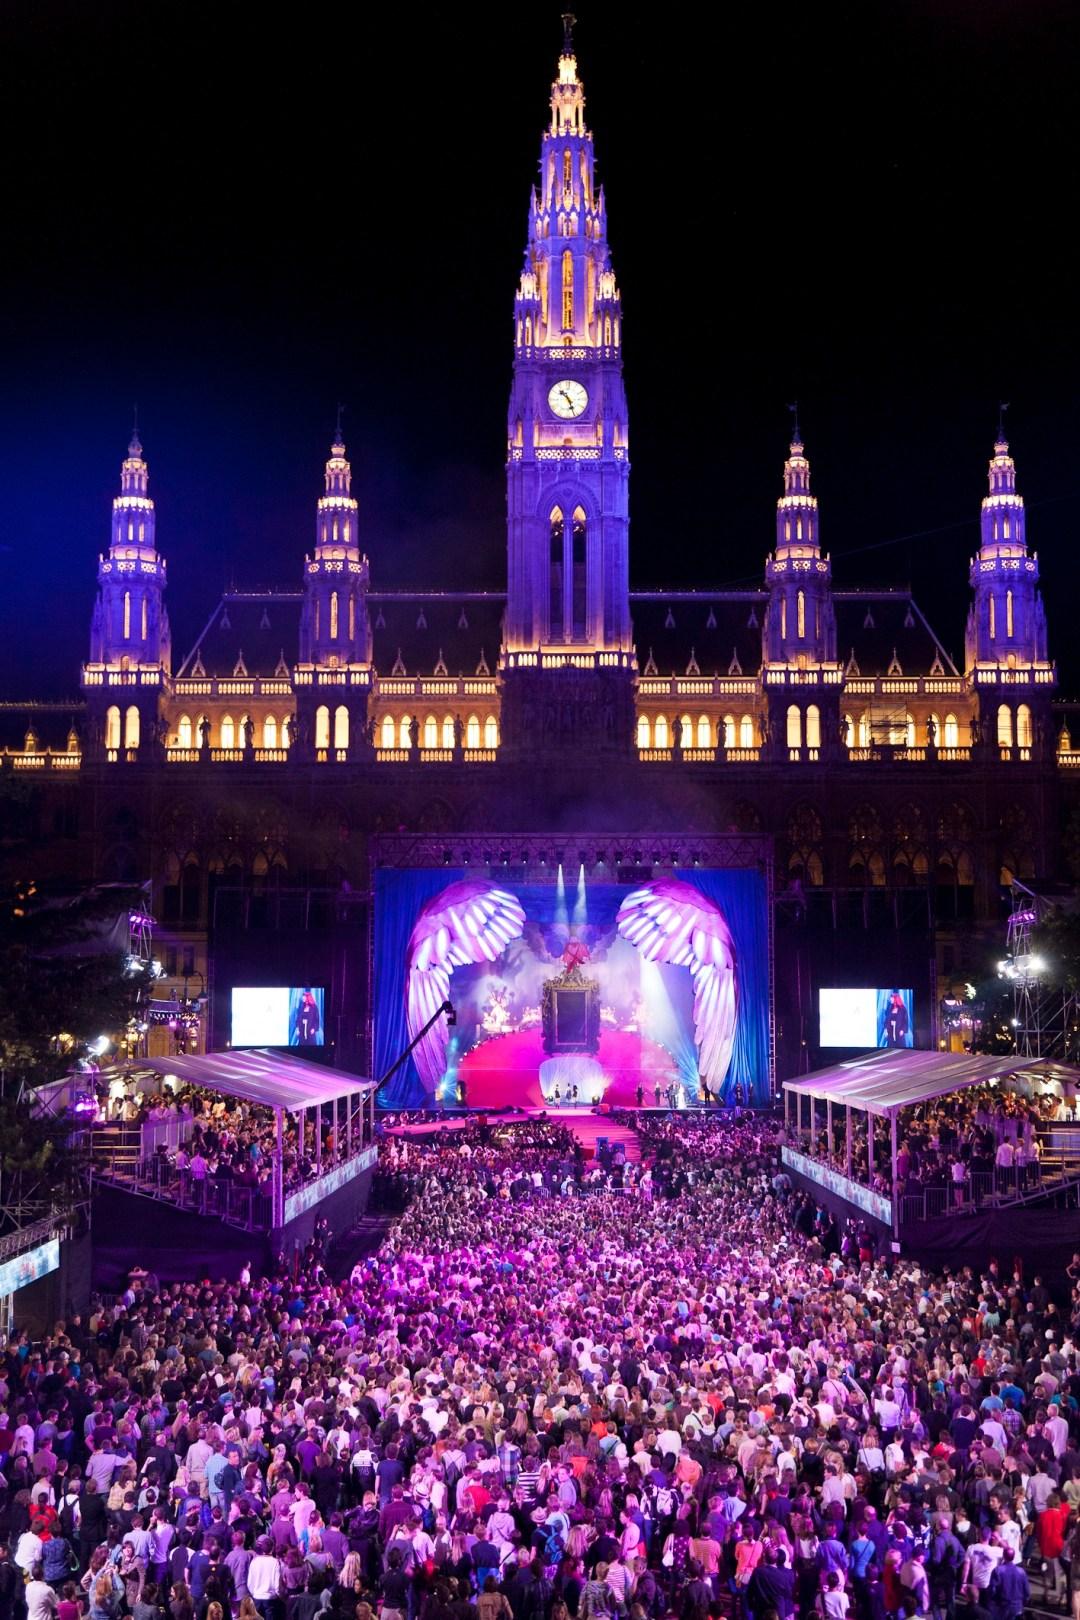 Life Ball in Vienna, Austria